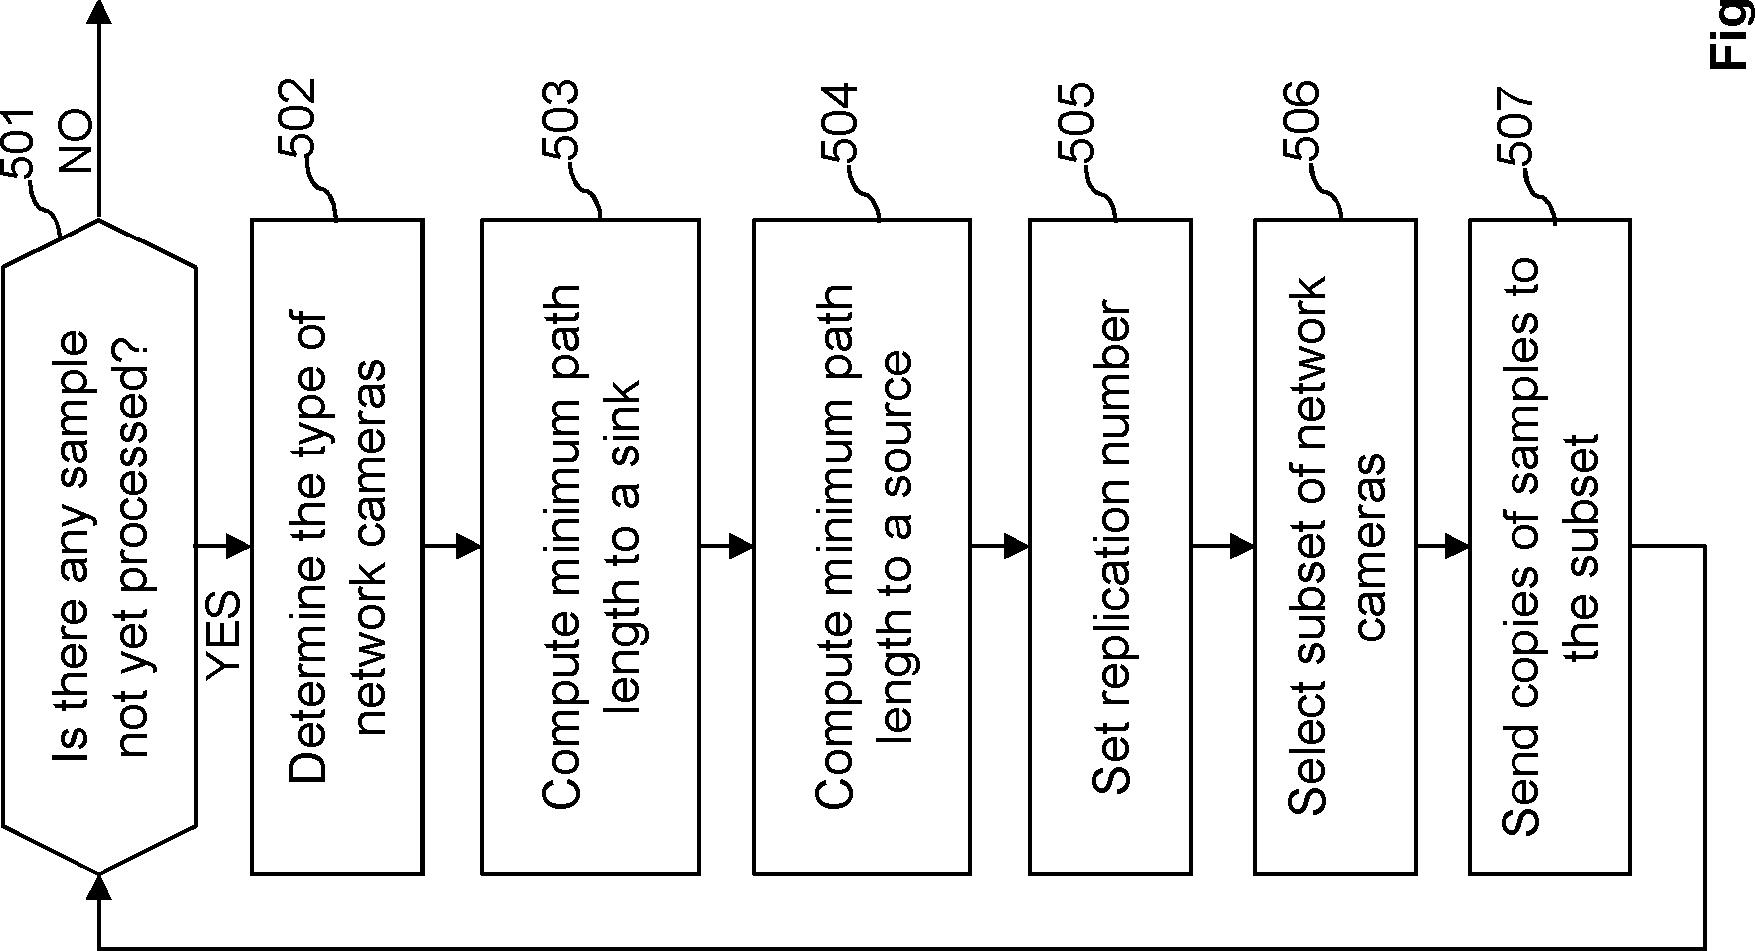 Figure GB2553108A_D0006